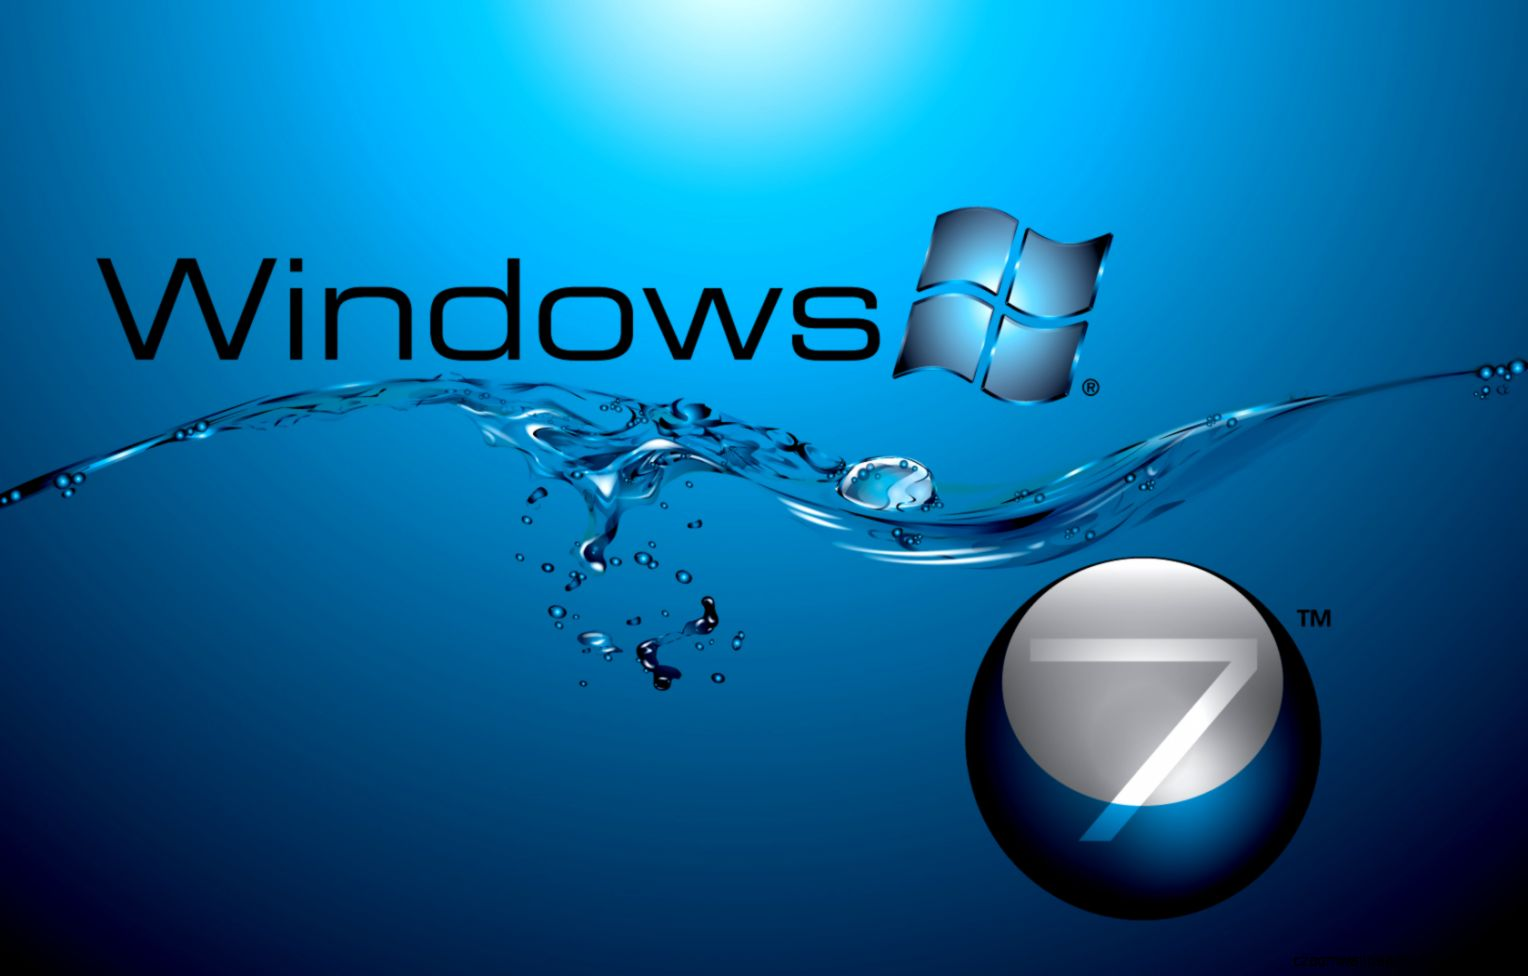 Windows 7 in Water  Free HD Wallpapers for Desktop iPad